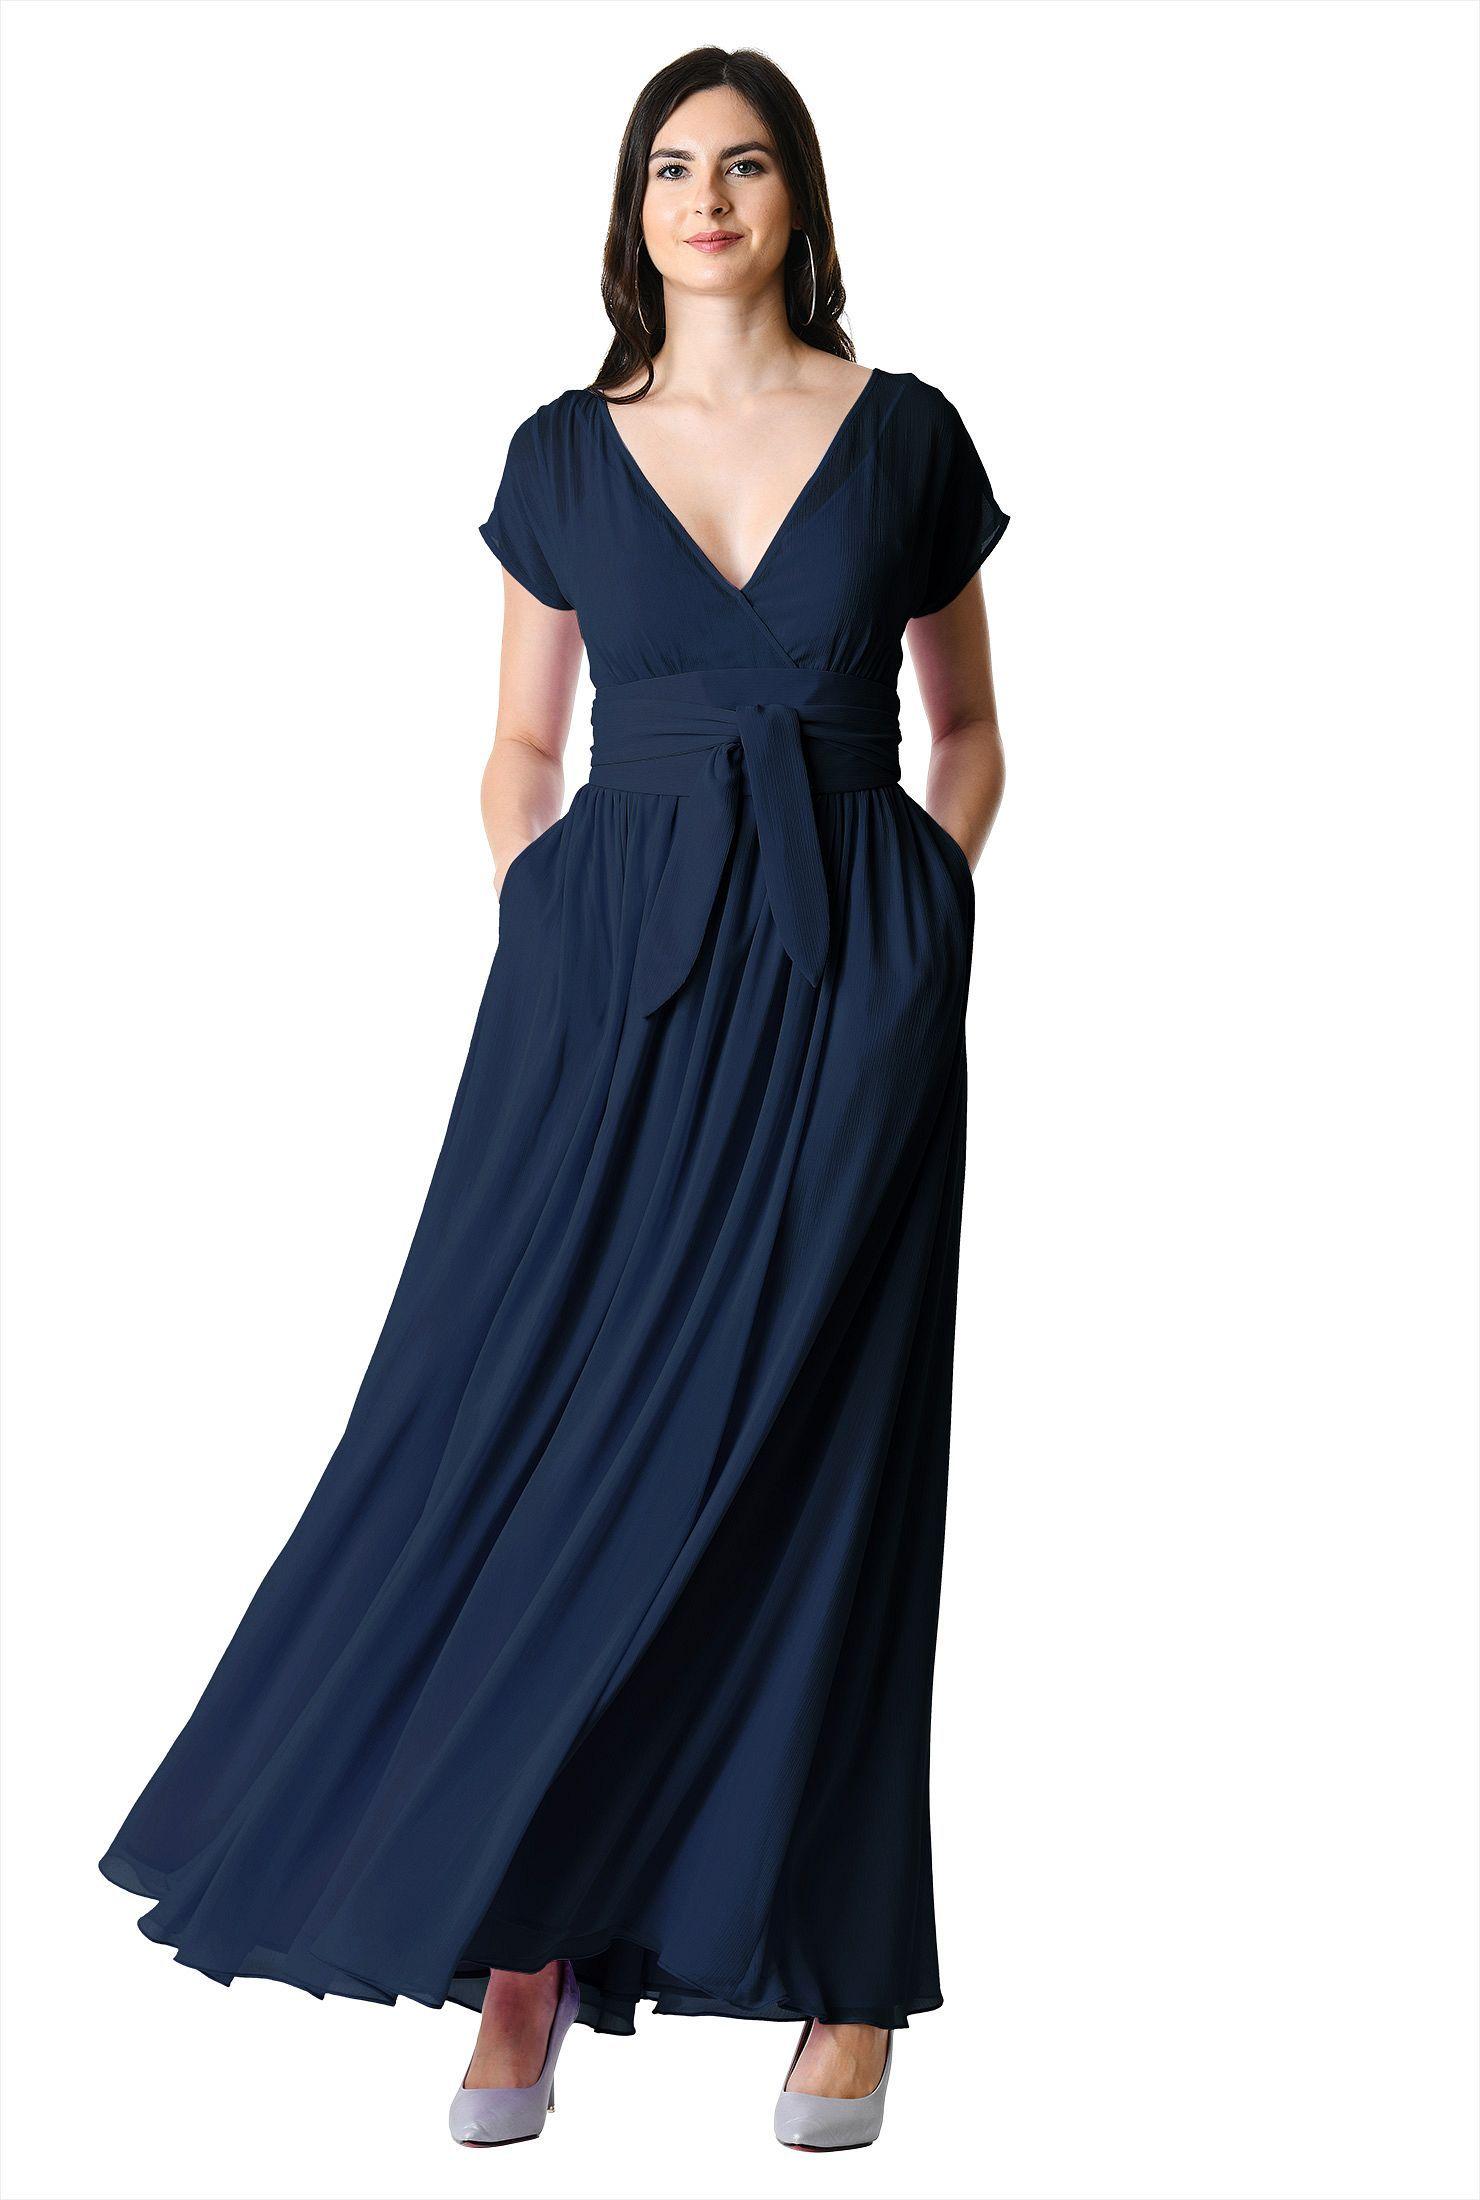 Sash Tie Chiffon Surplice Maxi Dress Dresses Womens Maxi Dresses Sheer Chiffon Dress [ 2200 x 1480 Pixel ]